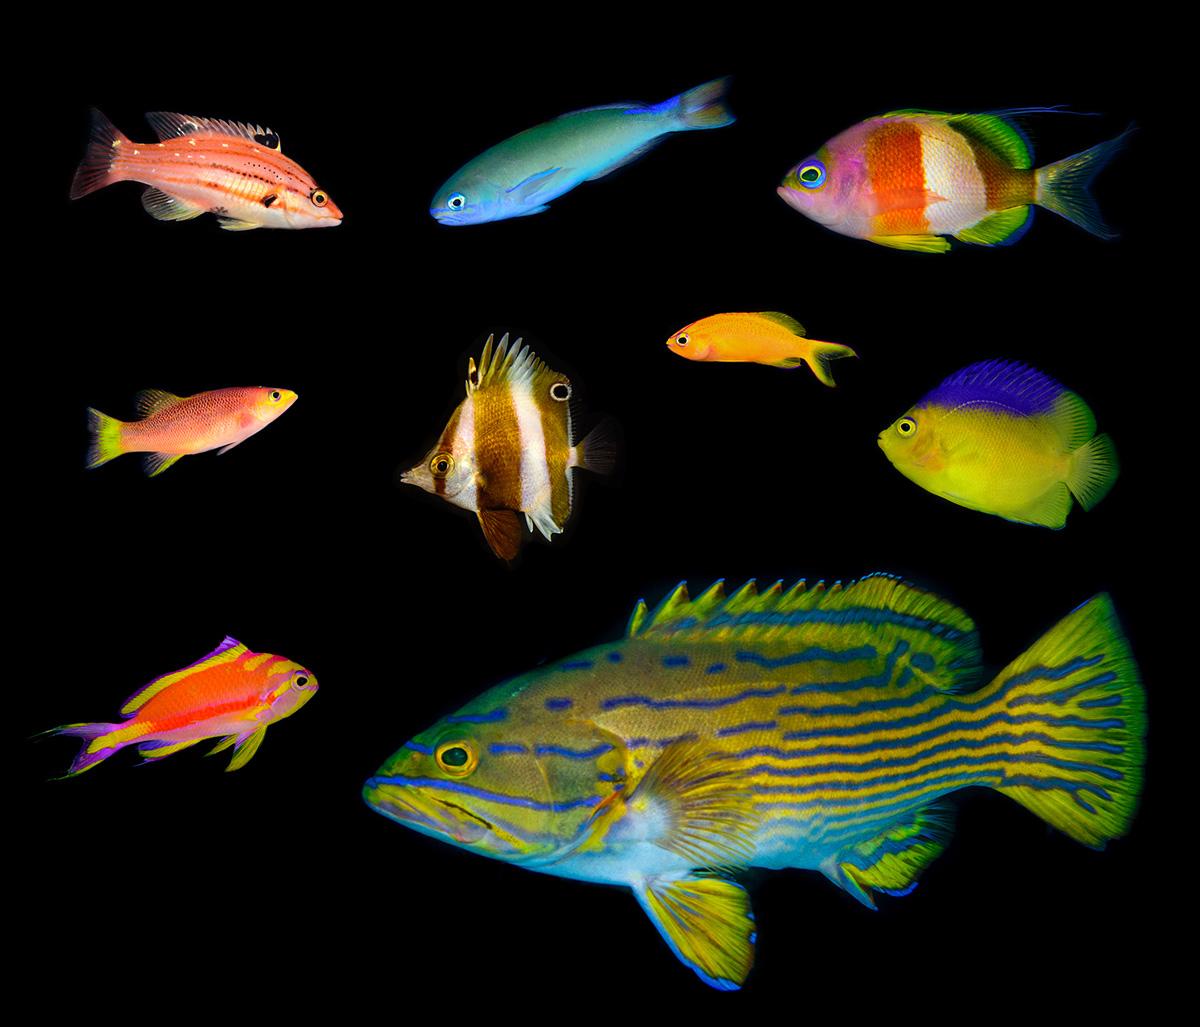 Mesophotic_fishes.jpg